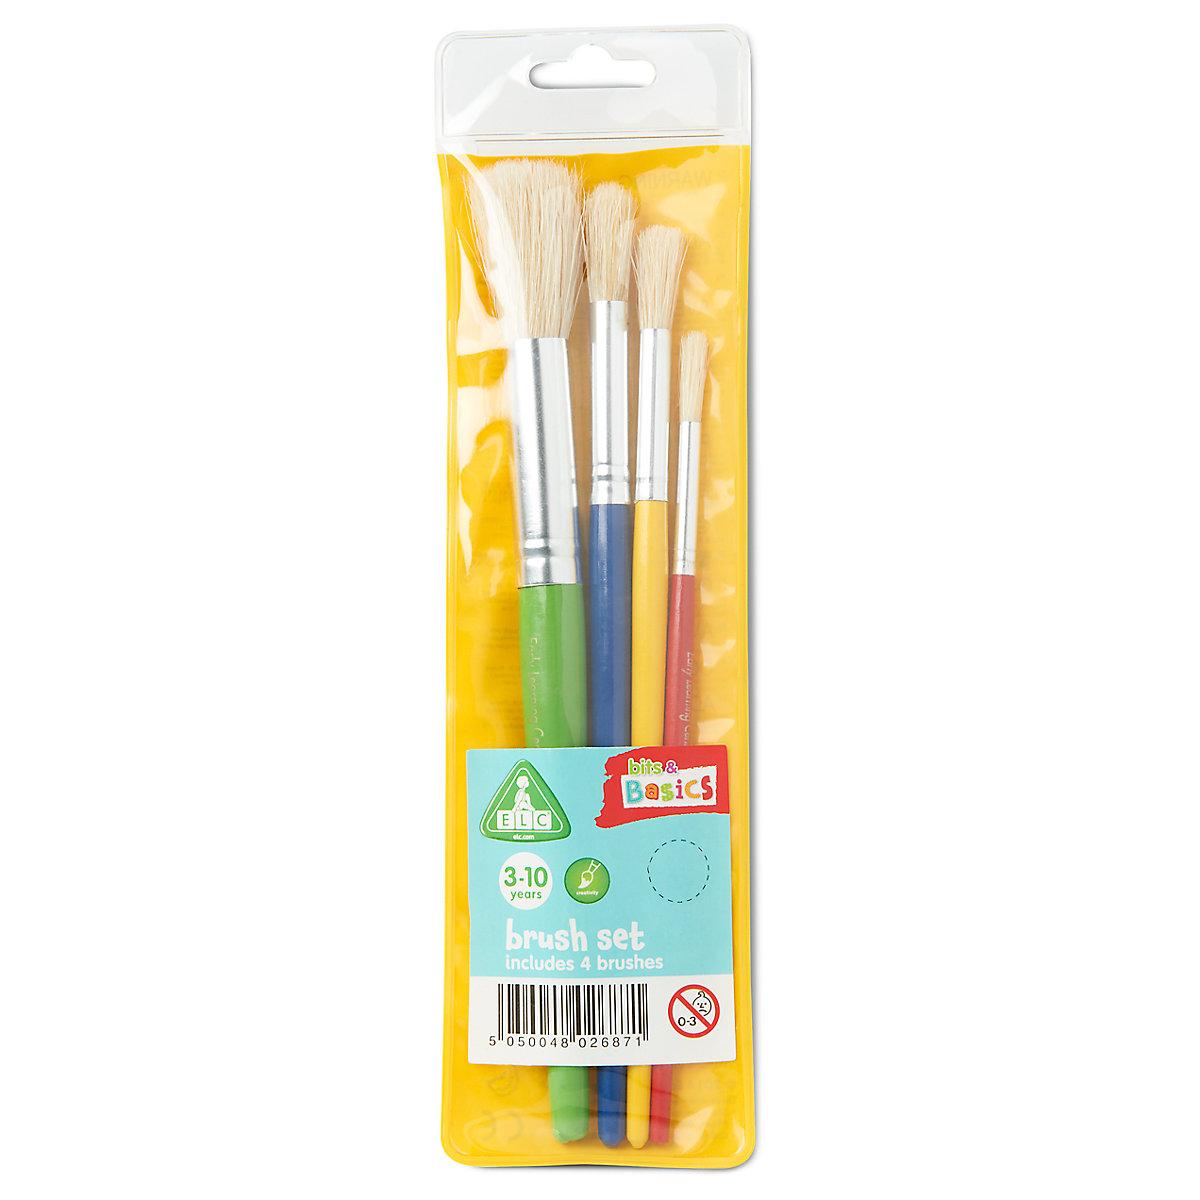 Elc Paint Brushes